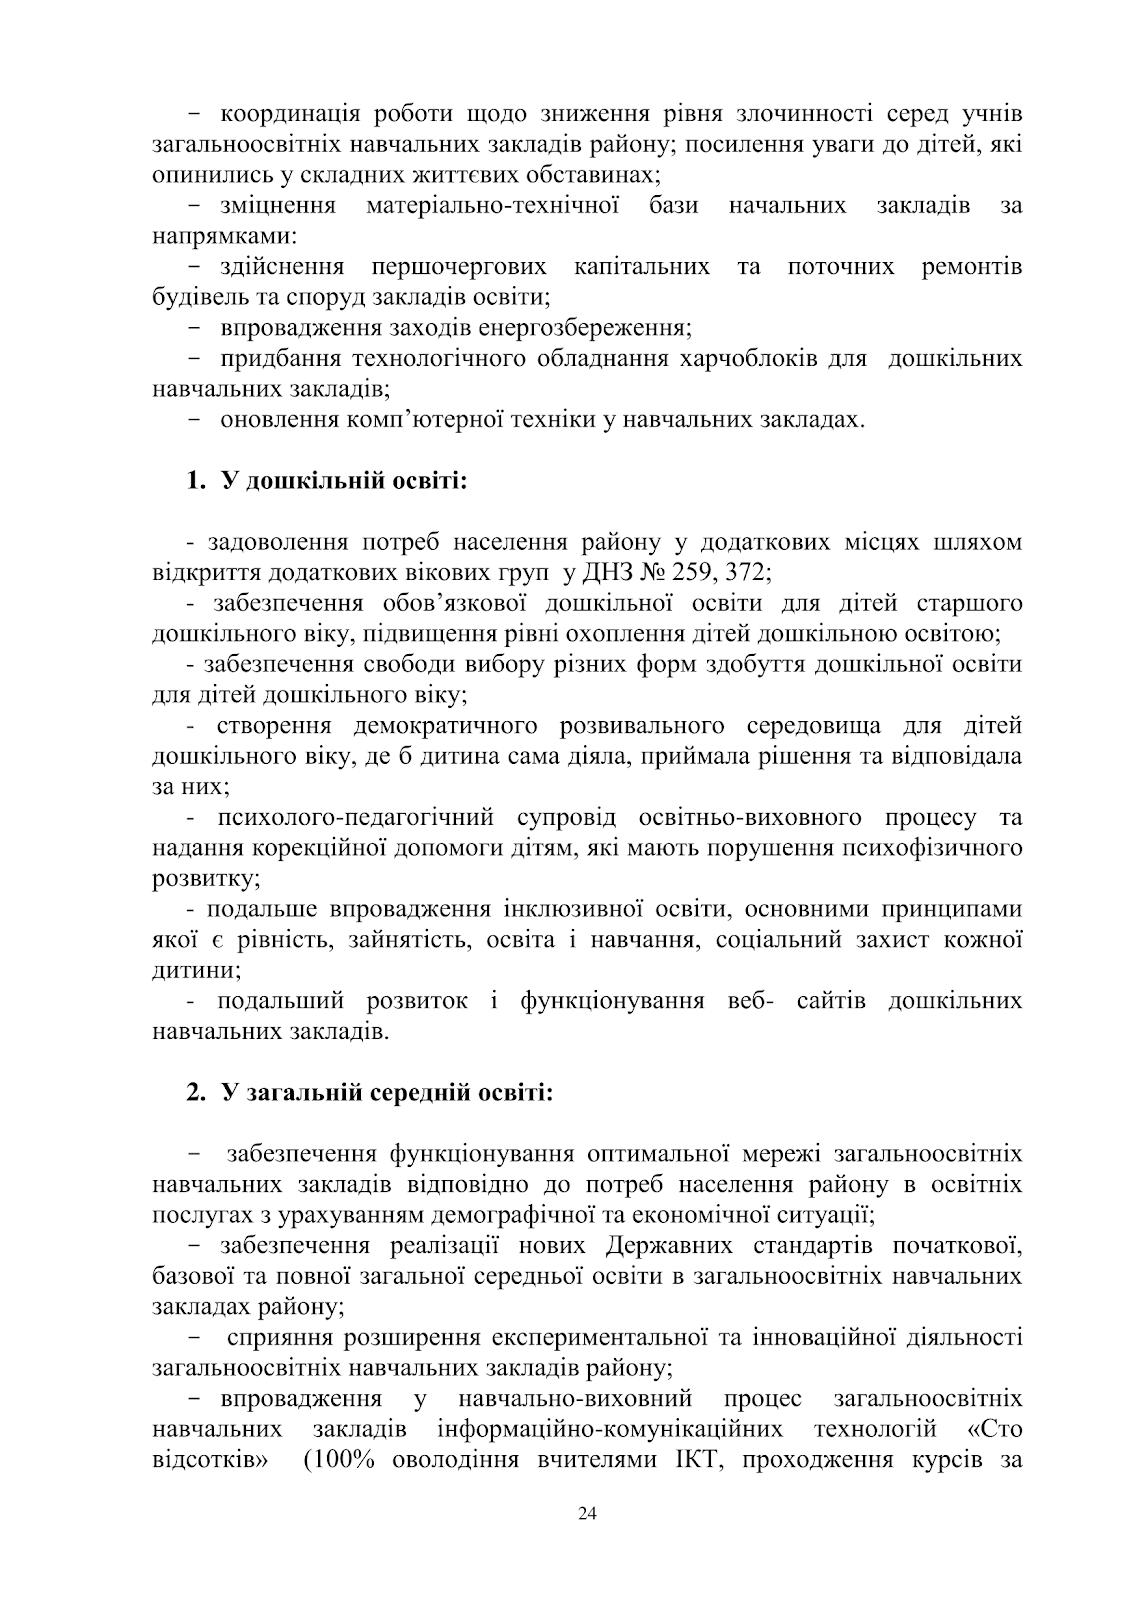 C:\Users\Валерия\Desktop\план 2016 рік\план 2016 рік-024.png